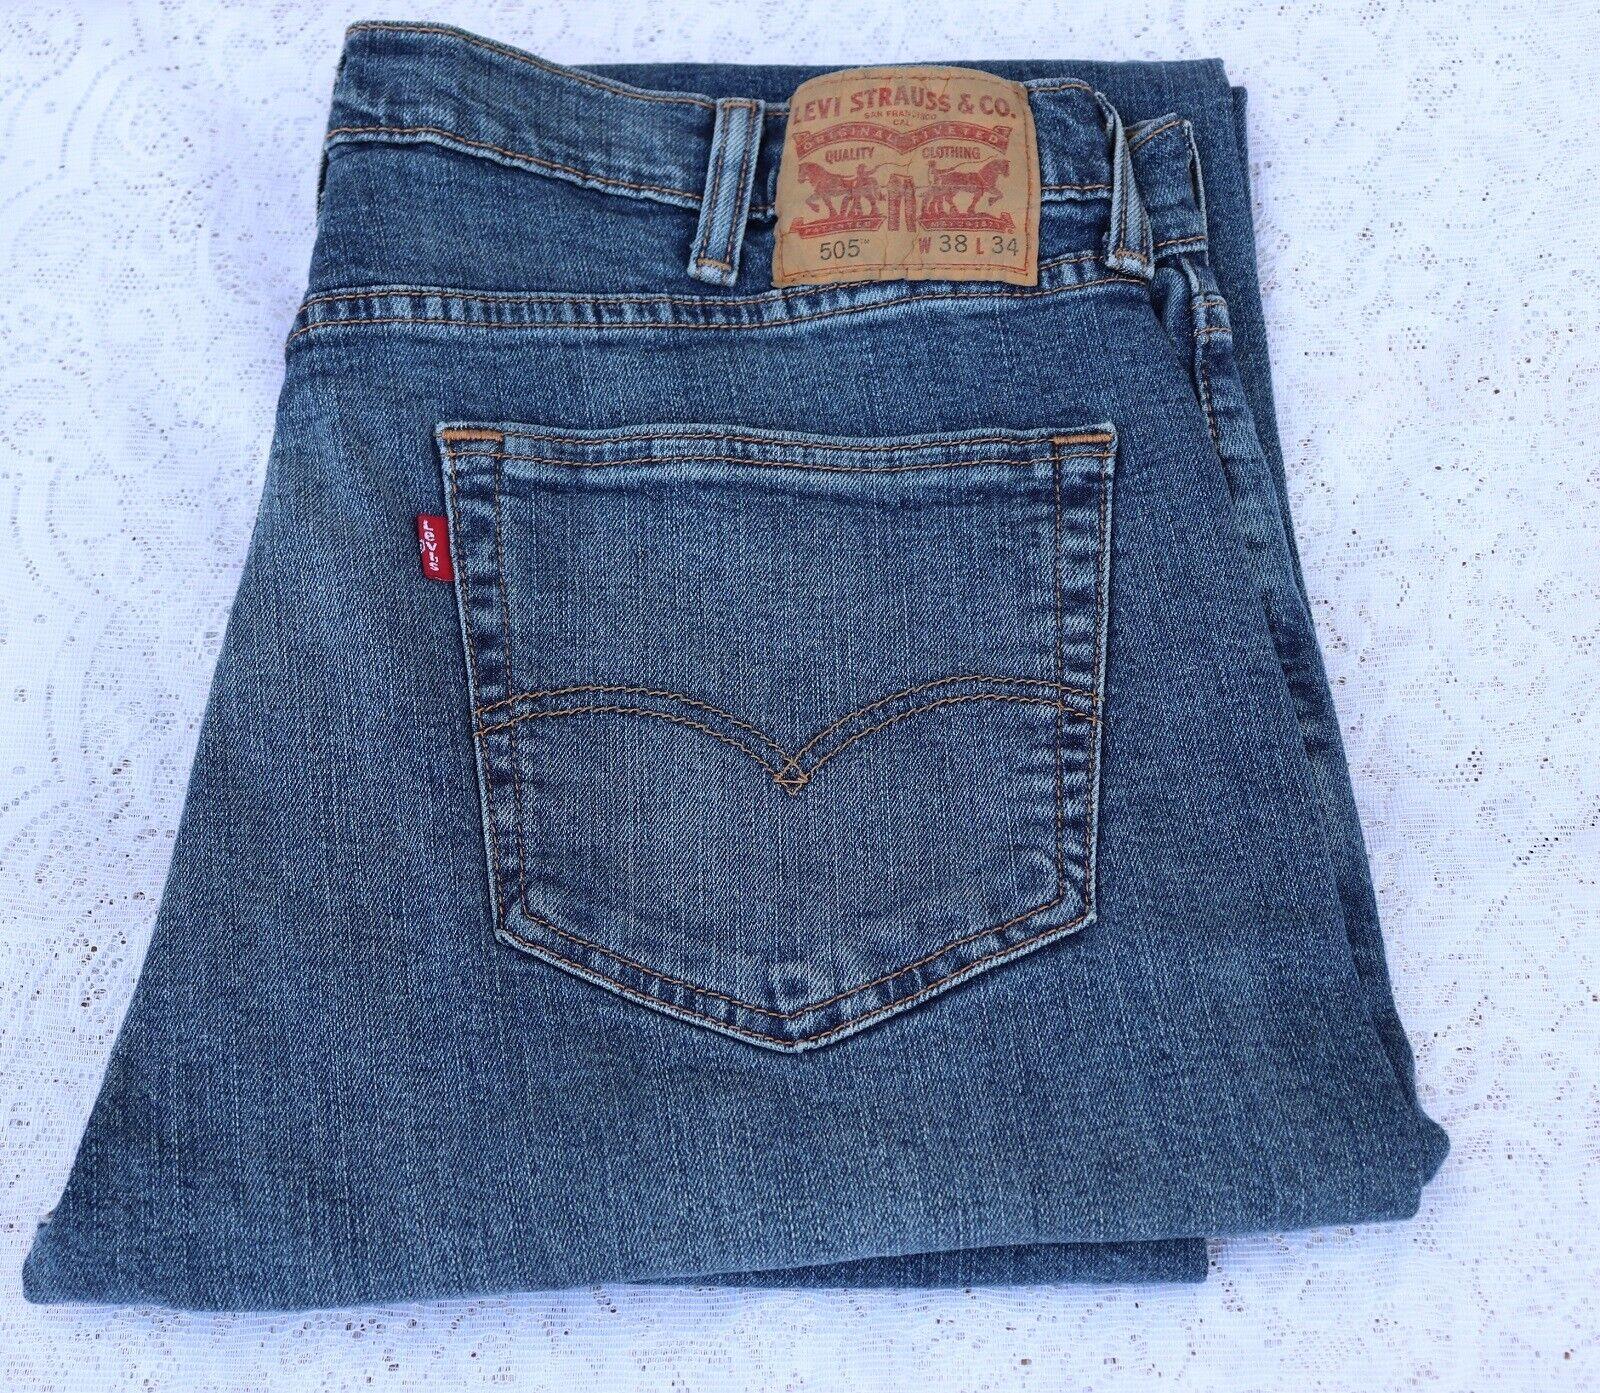 f14c81ddaa5 Levi's Men's 505 Original Fit Jeans Straight Leg Zip Fly 100 Cotton ...